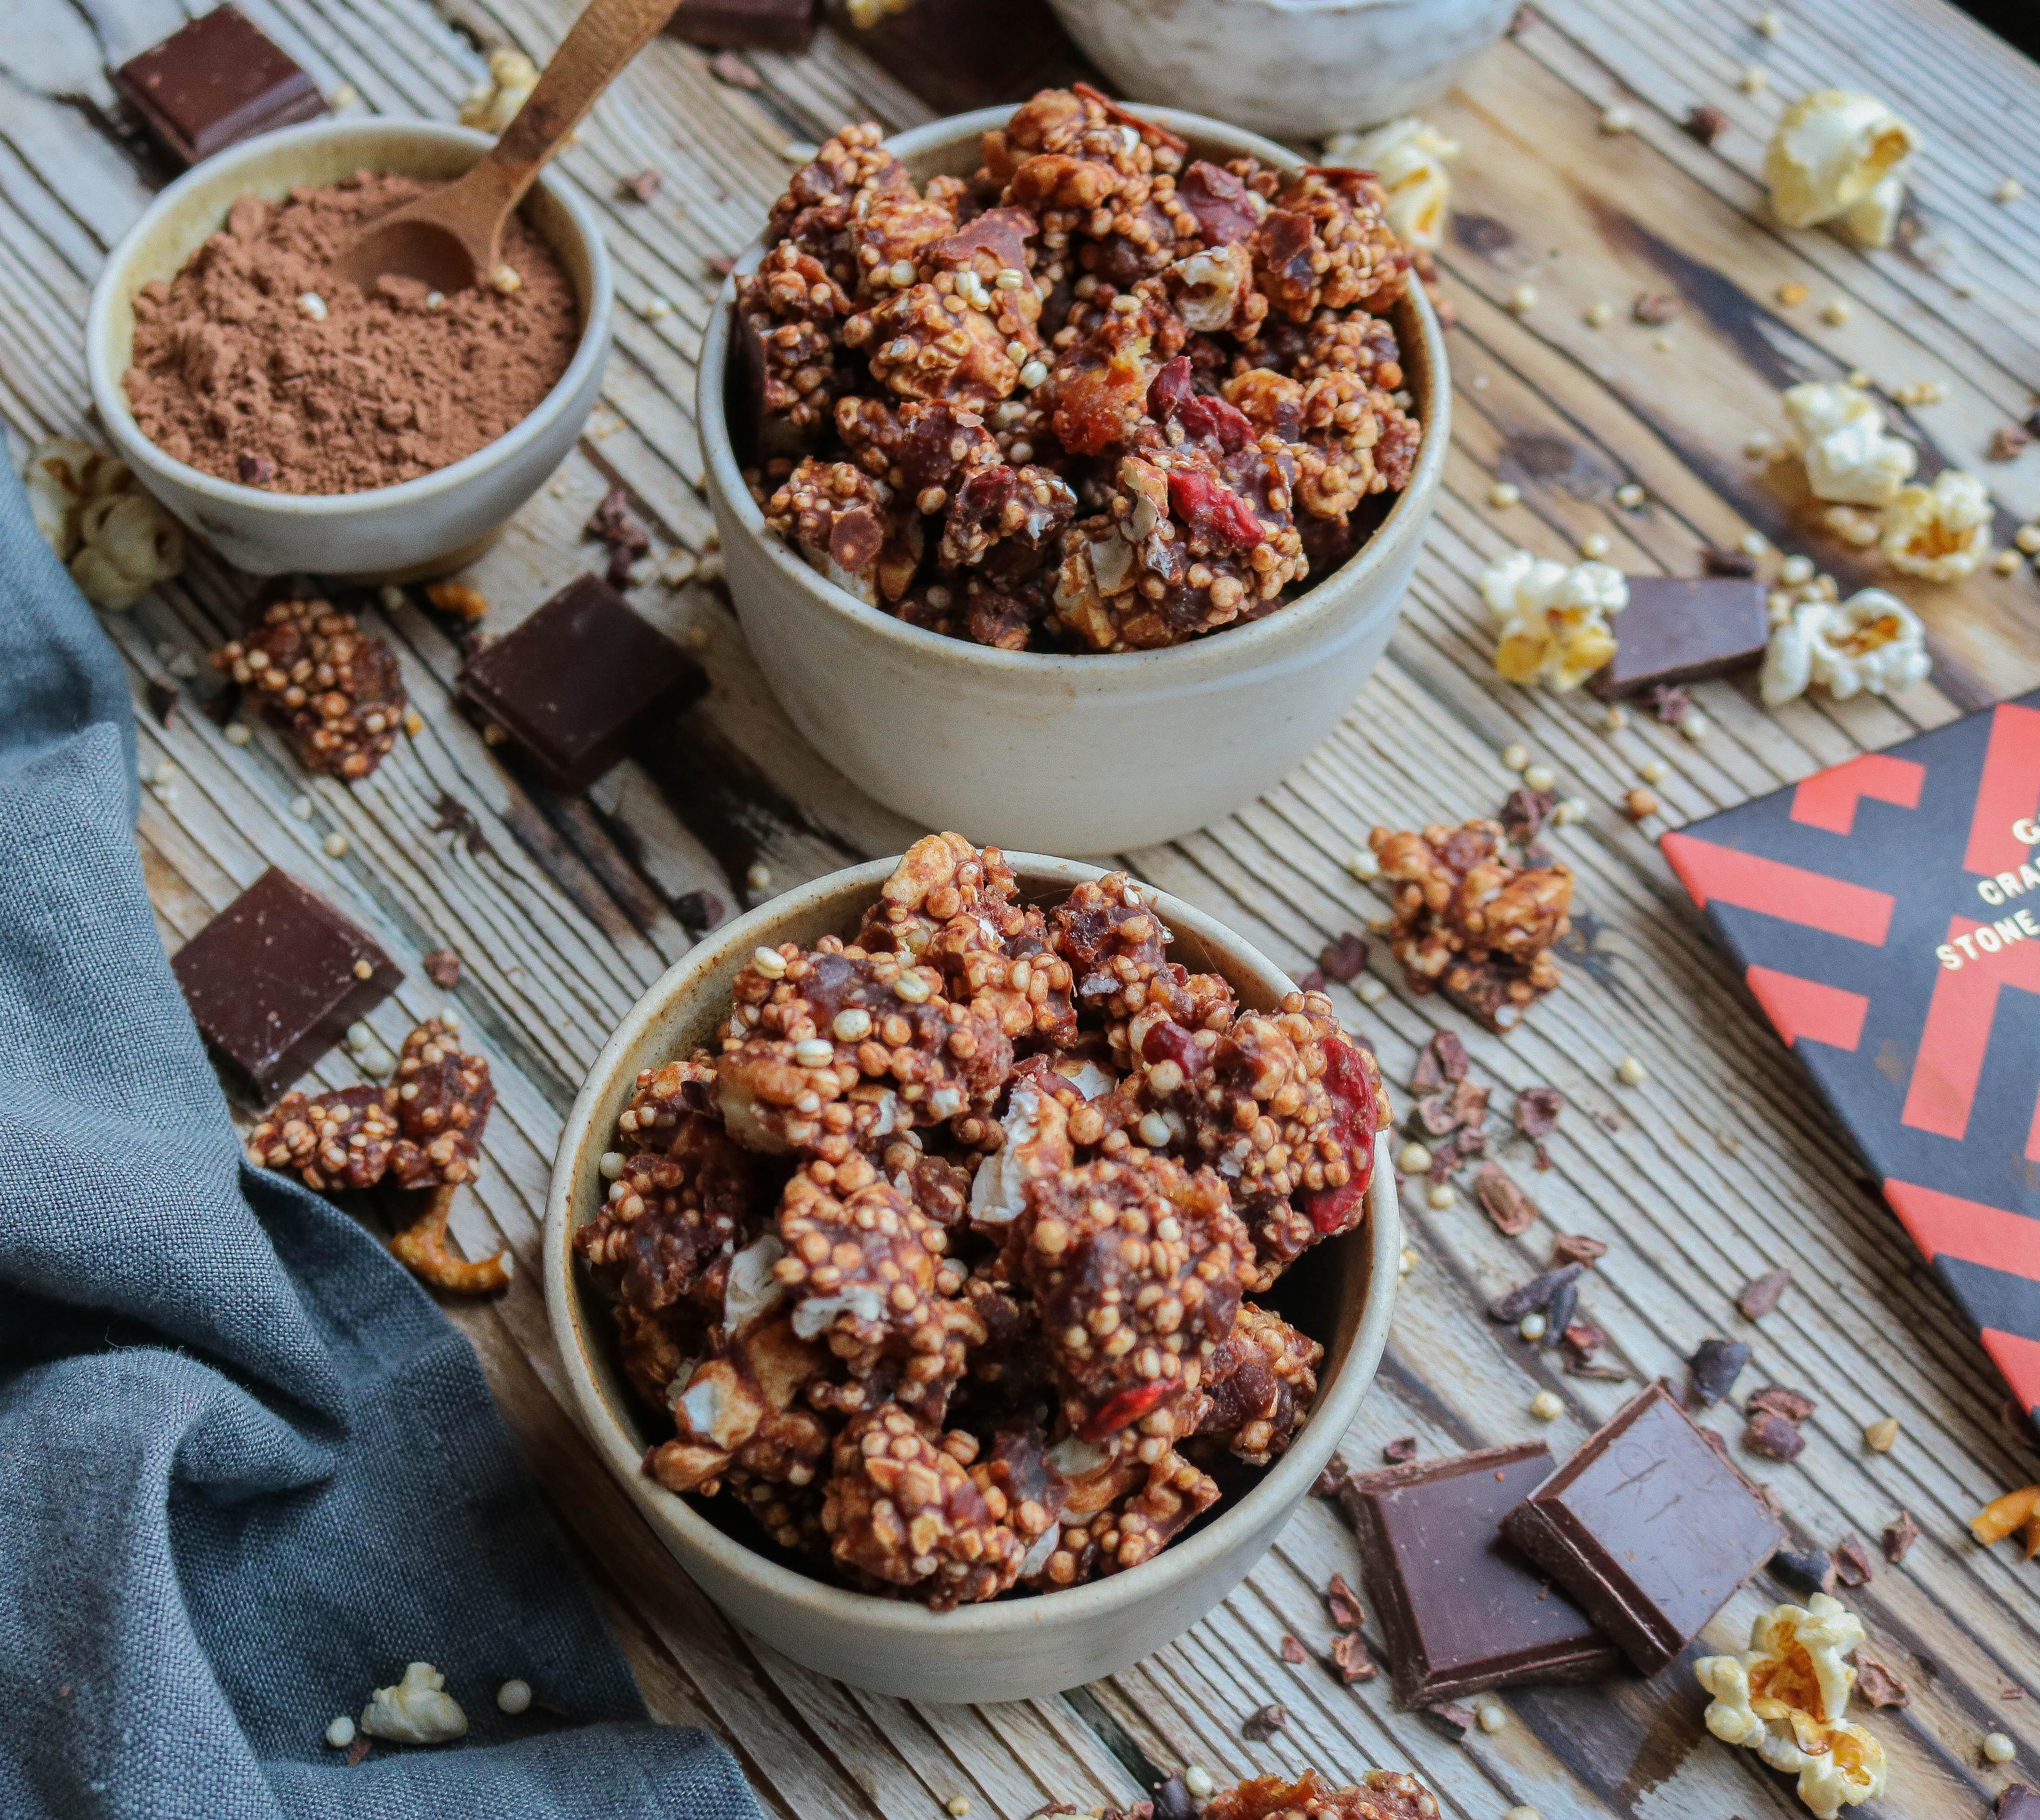 Popcorn & Quinoa Chocolate Clusters